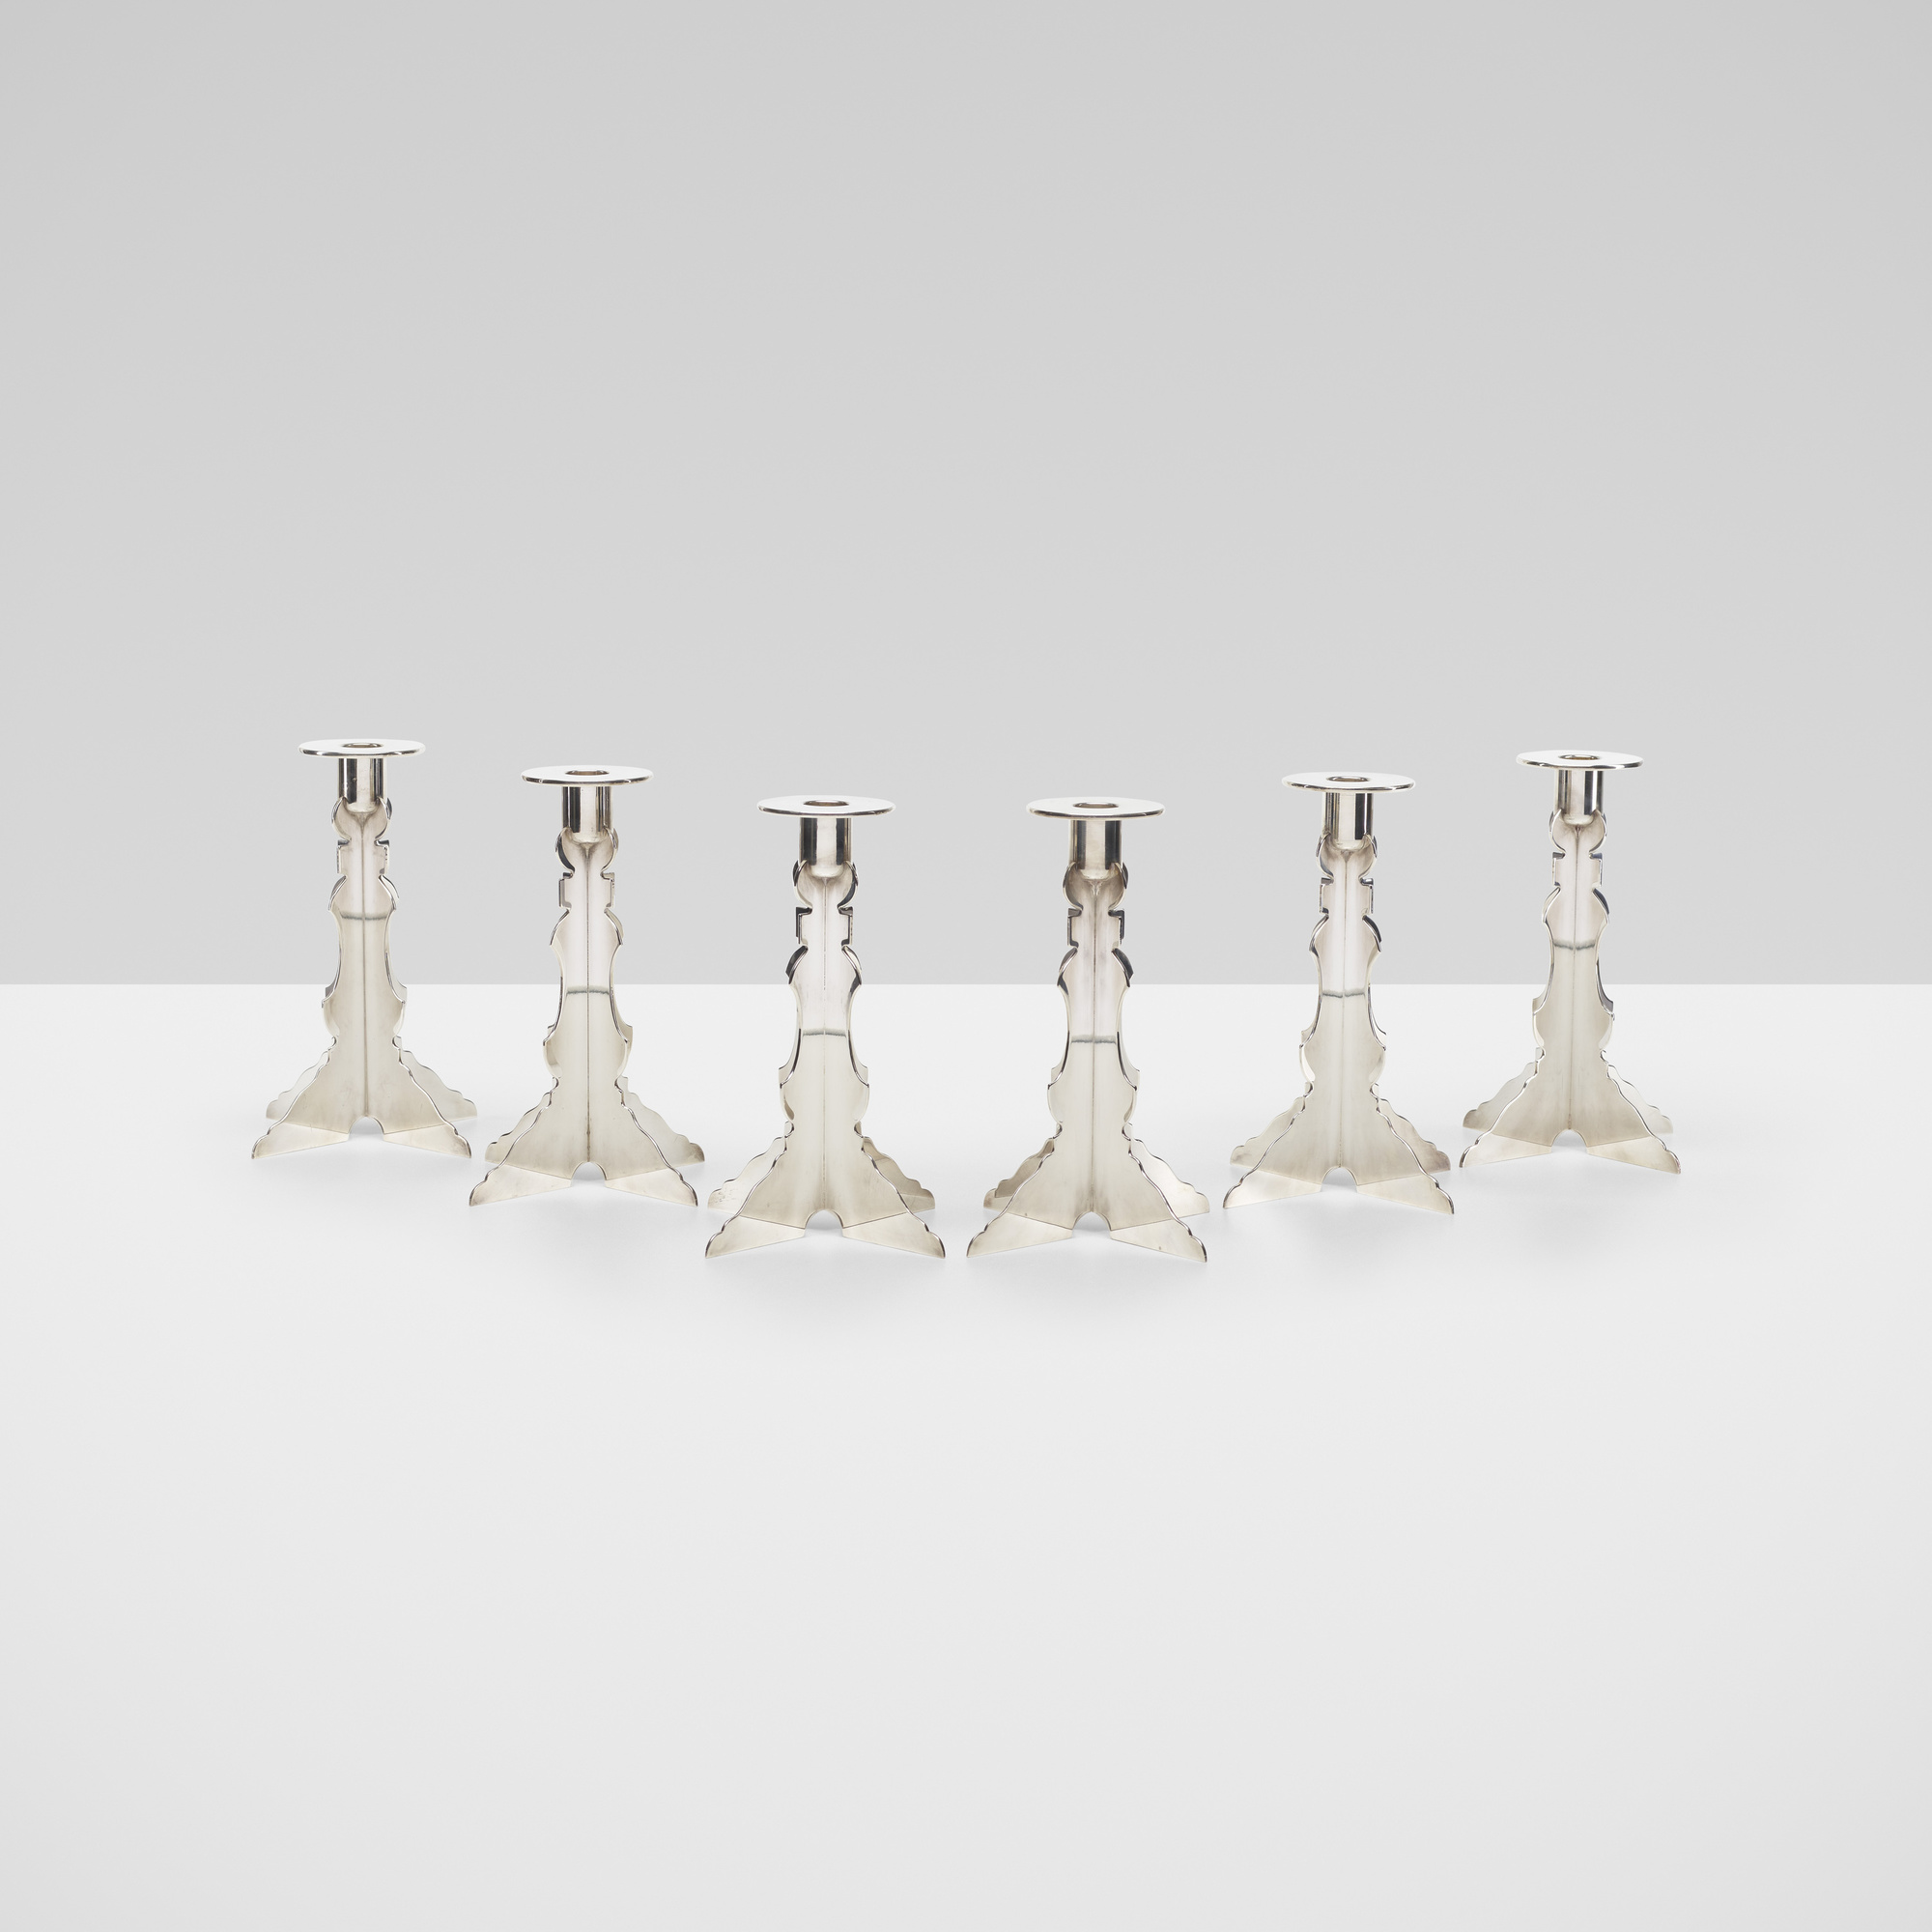 217: Robert Venturi with Denise Scott Brown / candlesticks, set of six (1 of 3)